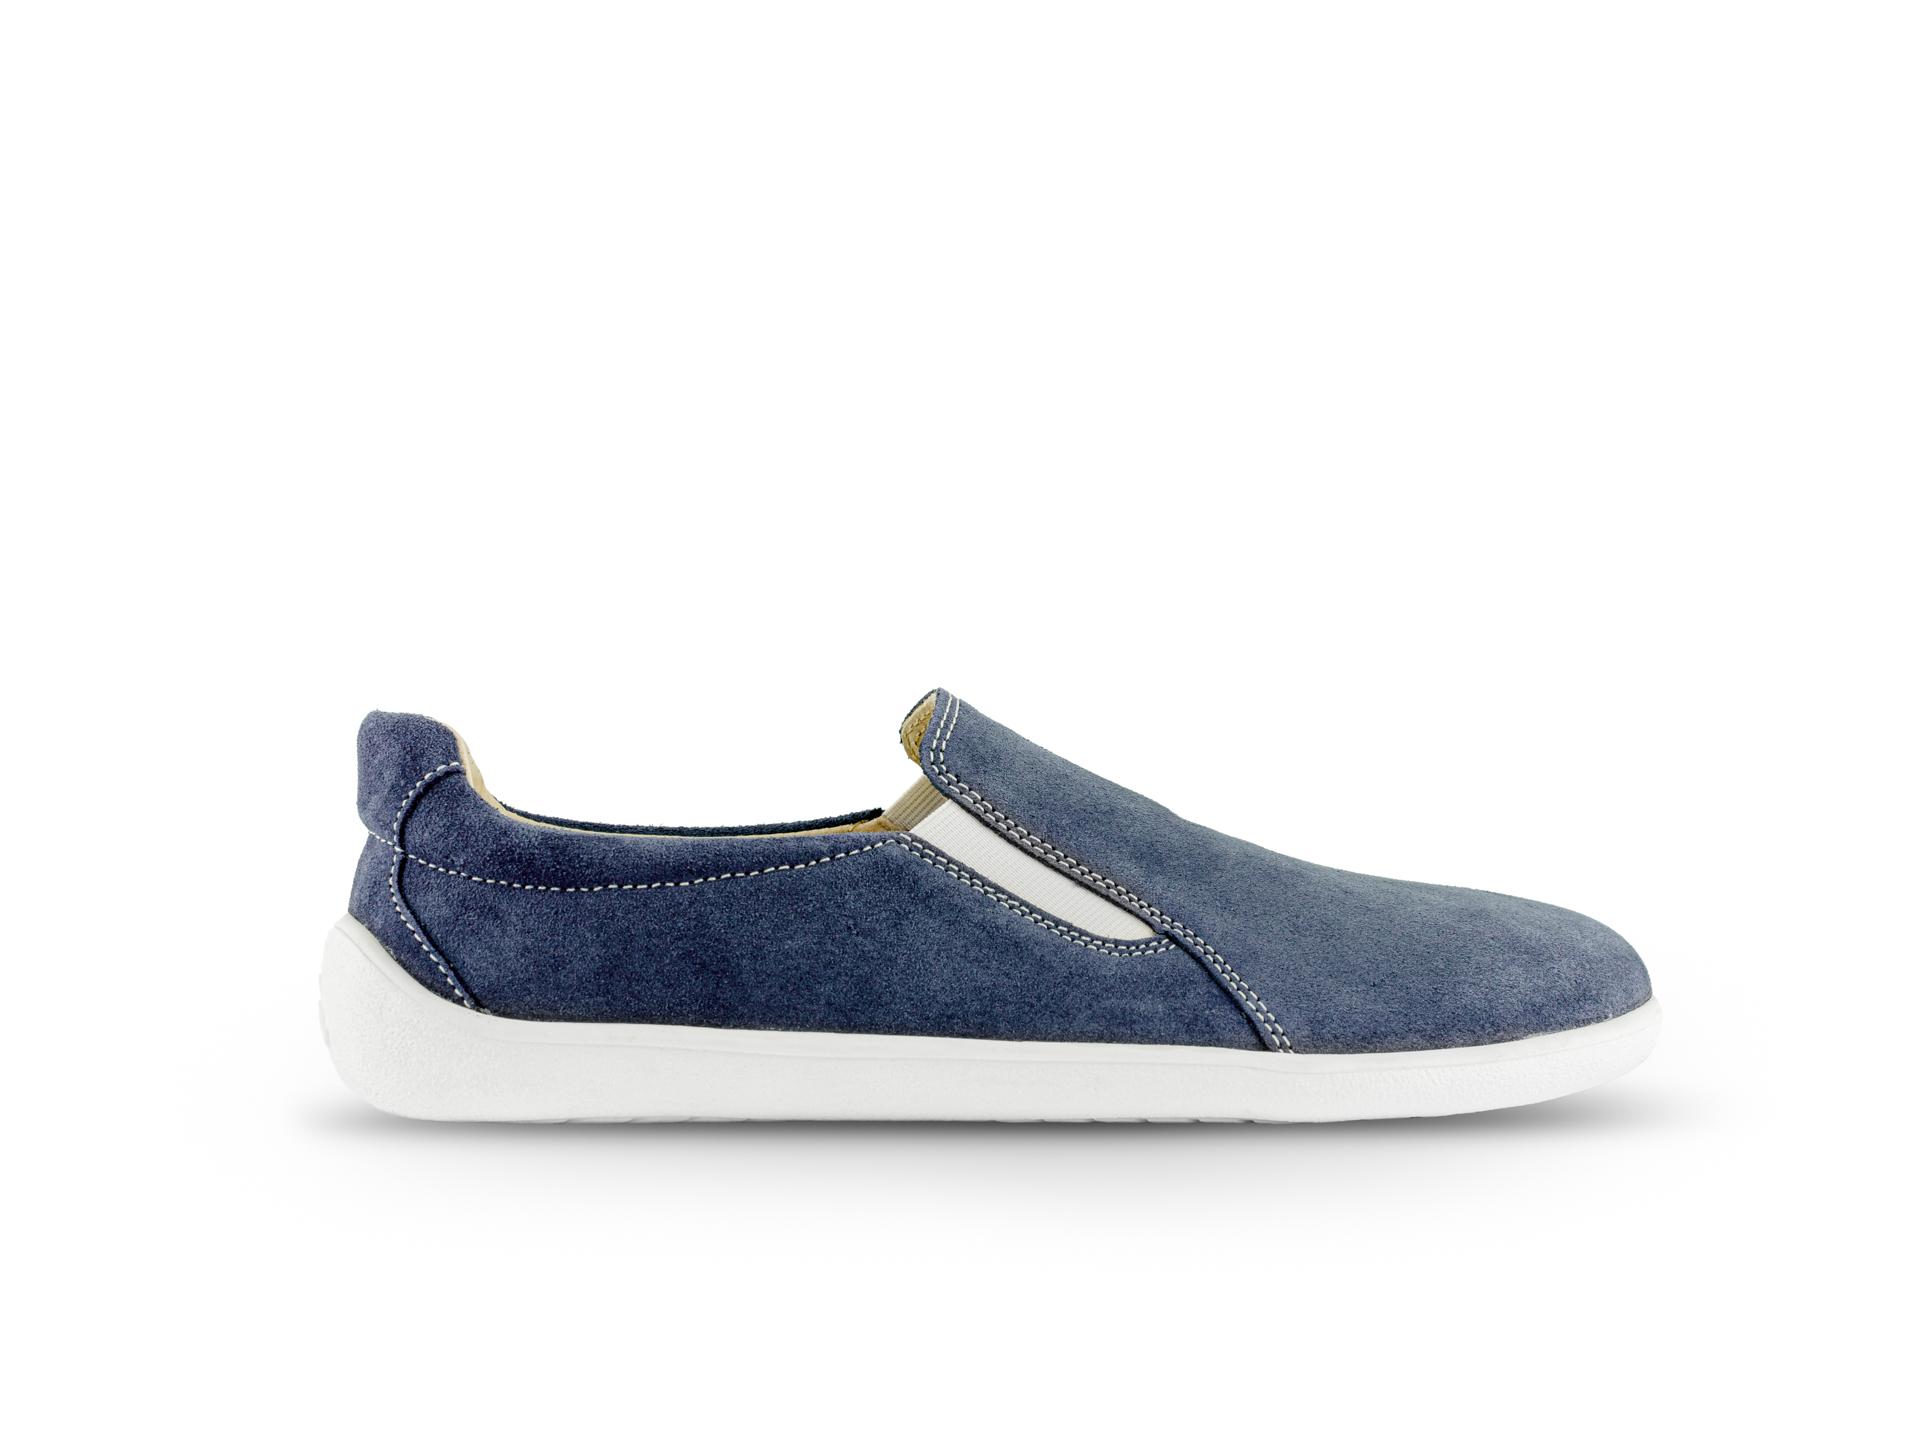 Barefoot Sneakers - Be Lenka Eazy - Navy 38